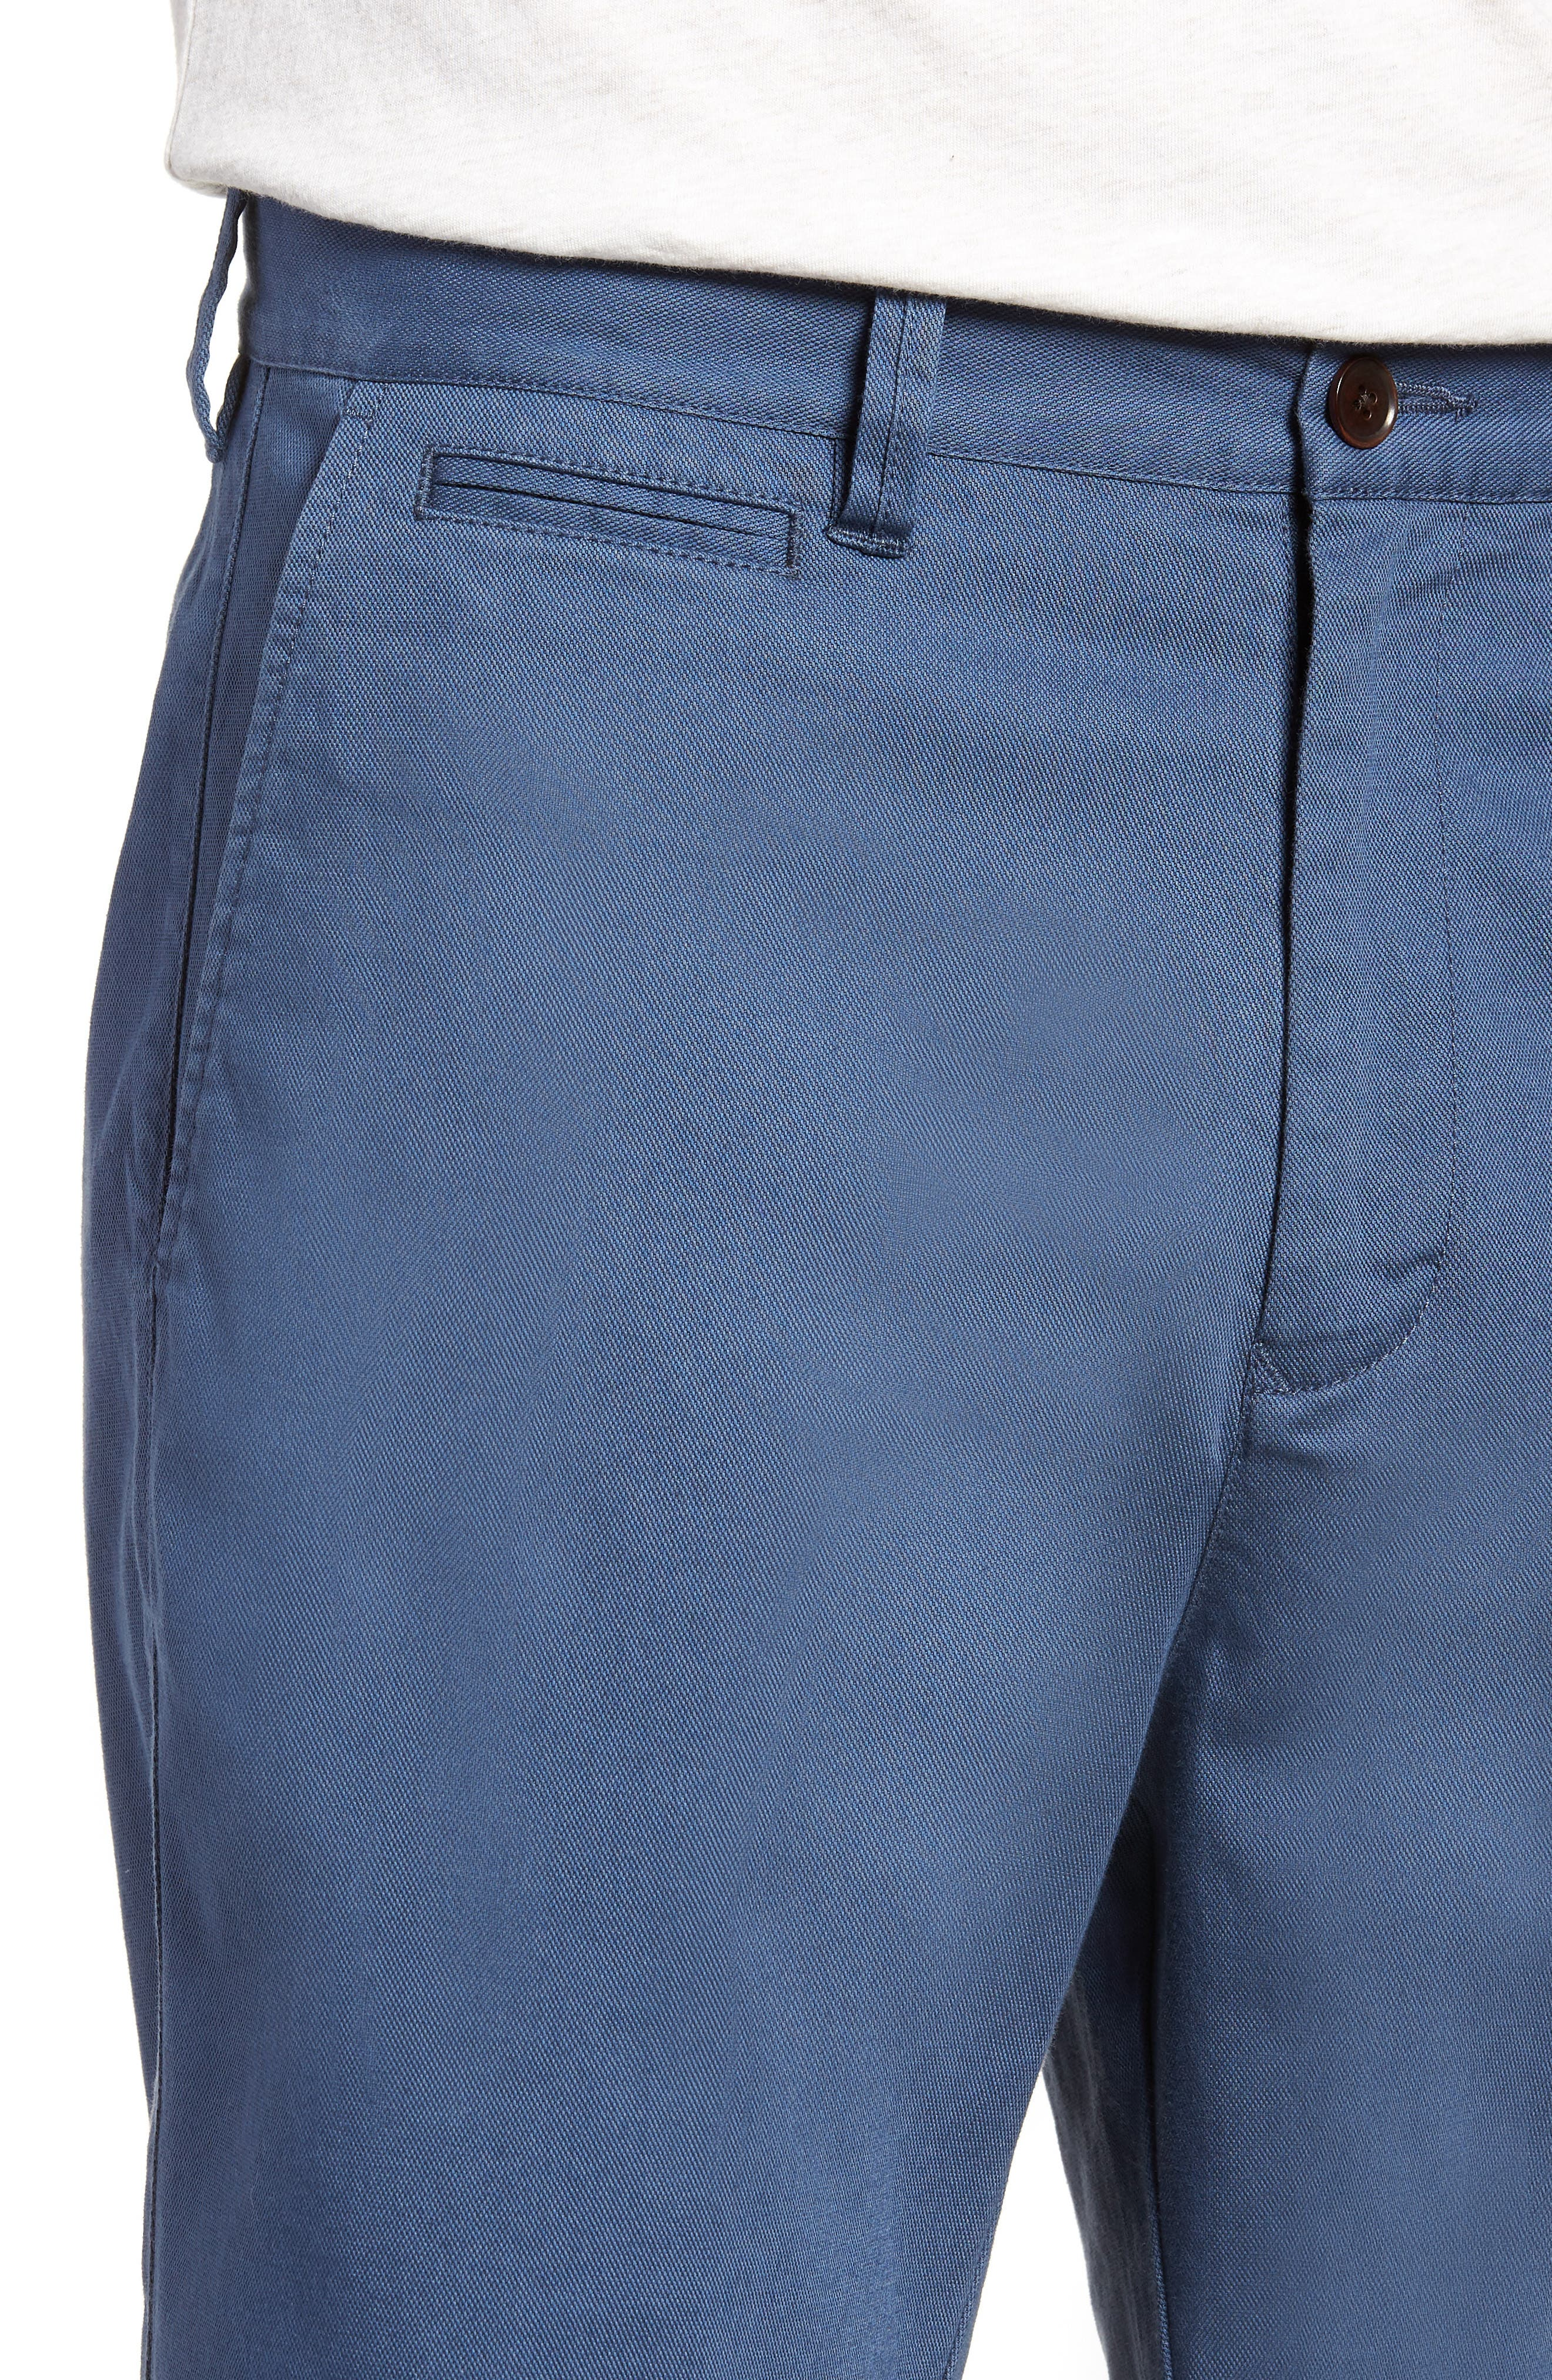 Driving Creek Regular Fit Flat Front Shorts,                             Alternate thumbnail 4, color,                             020